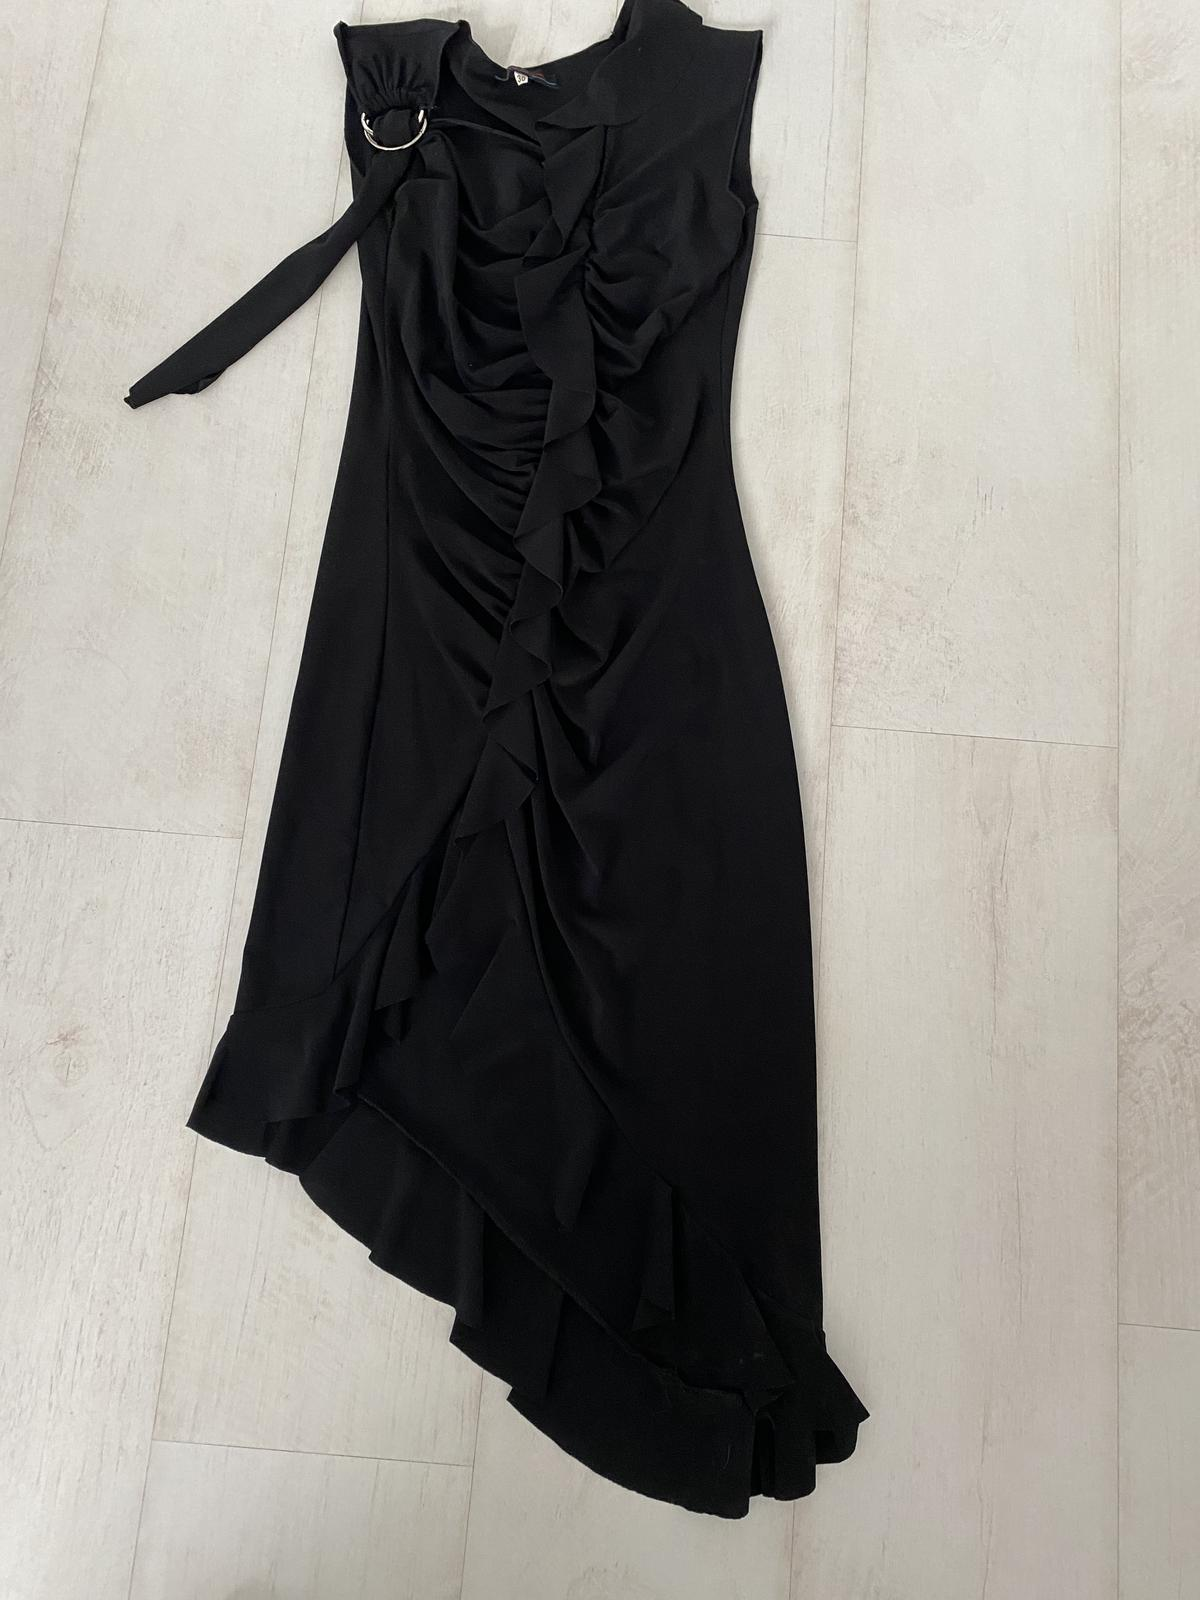 dámske spoločenské šaty čierne - Obrázok č. 1